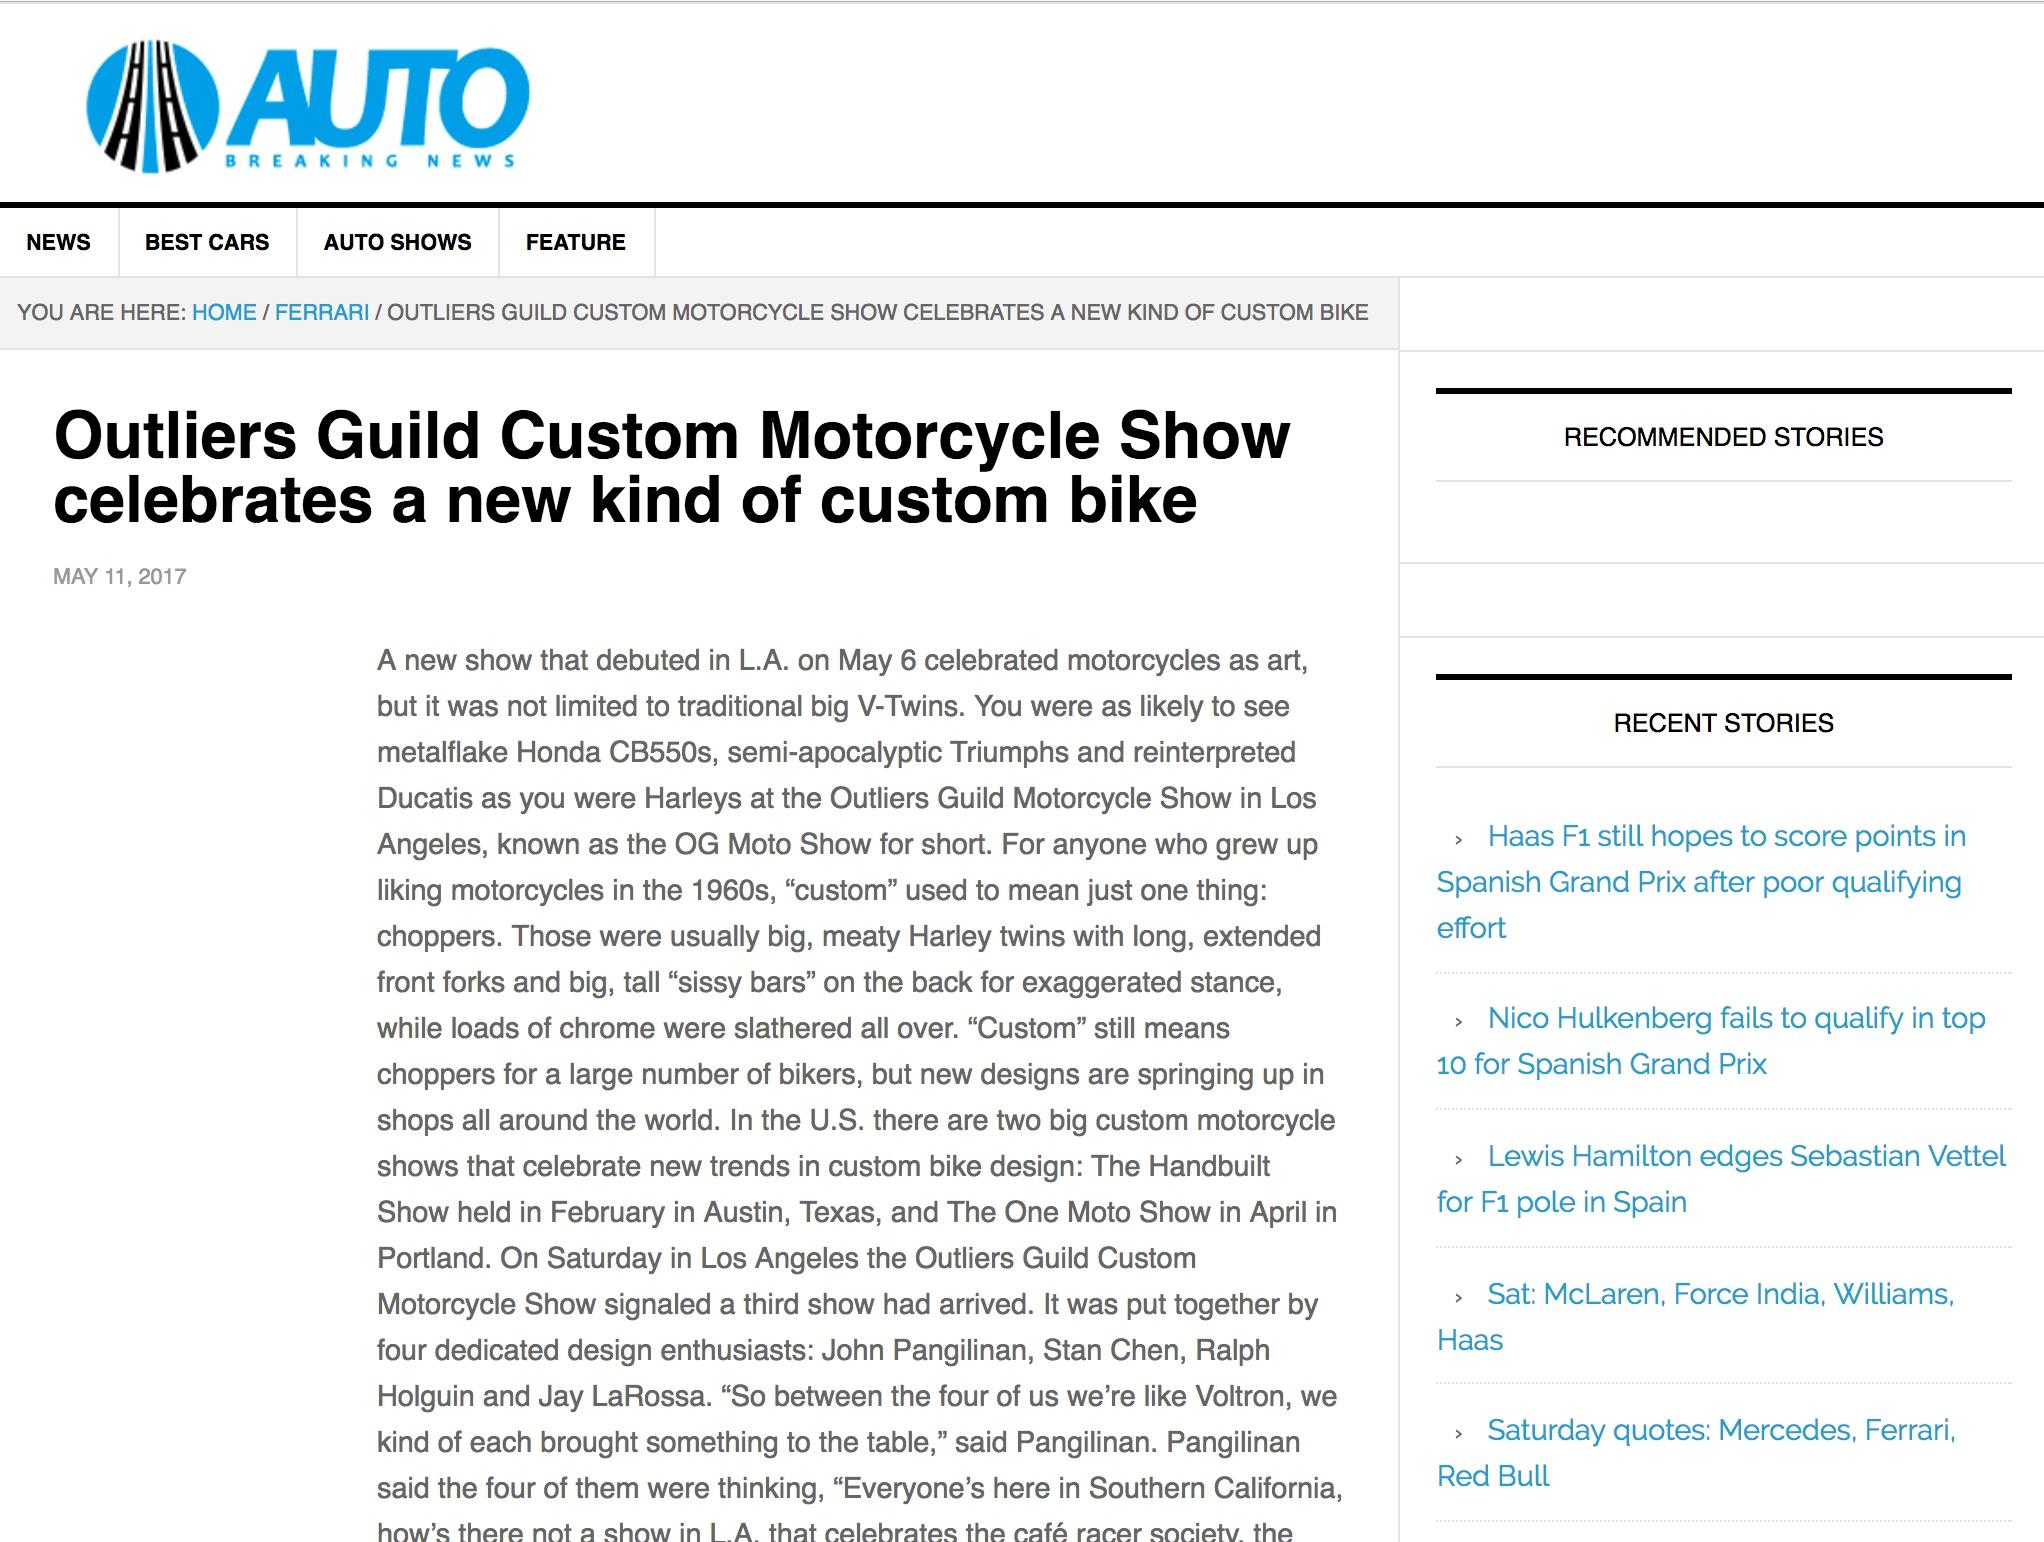 Article on Autobreaking News